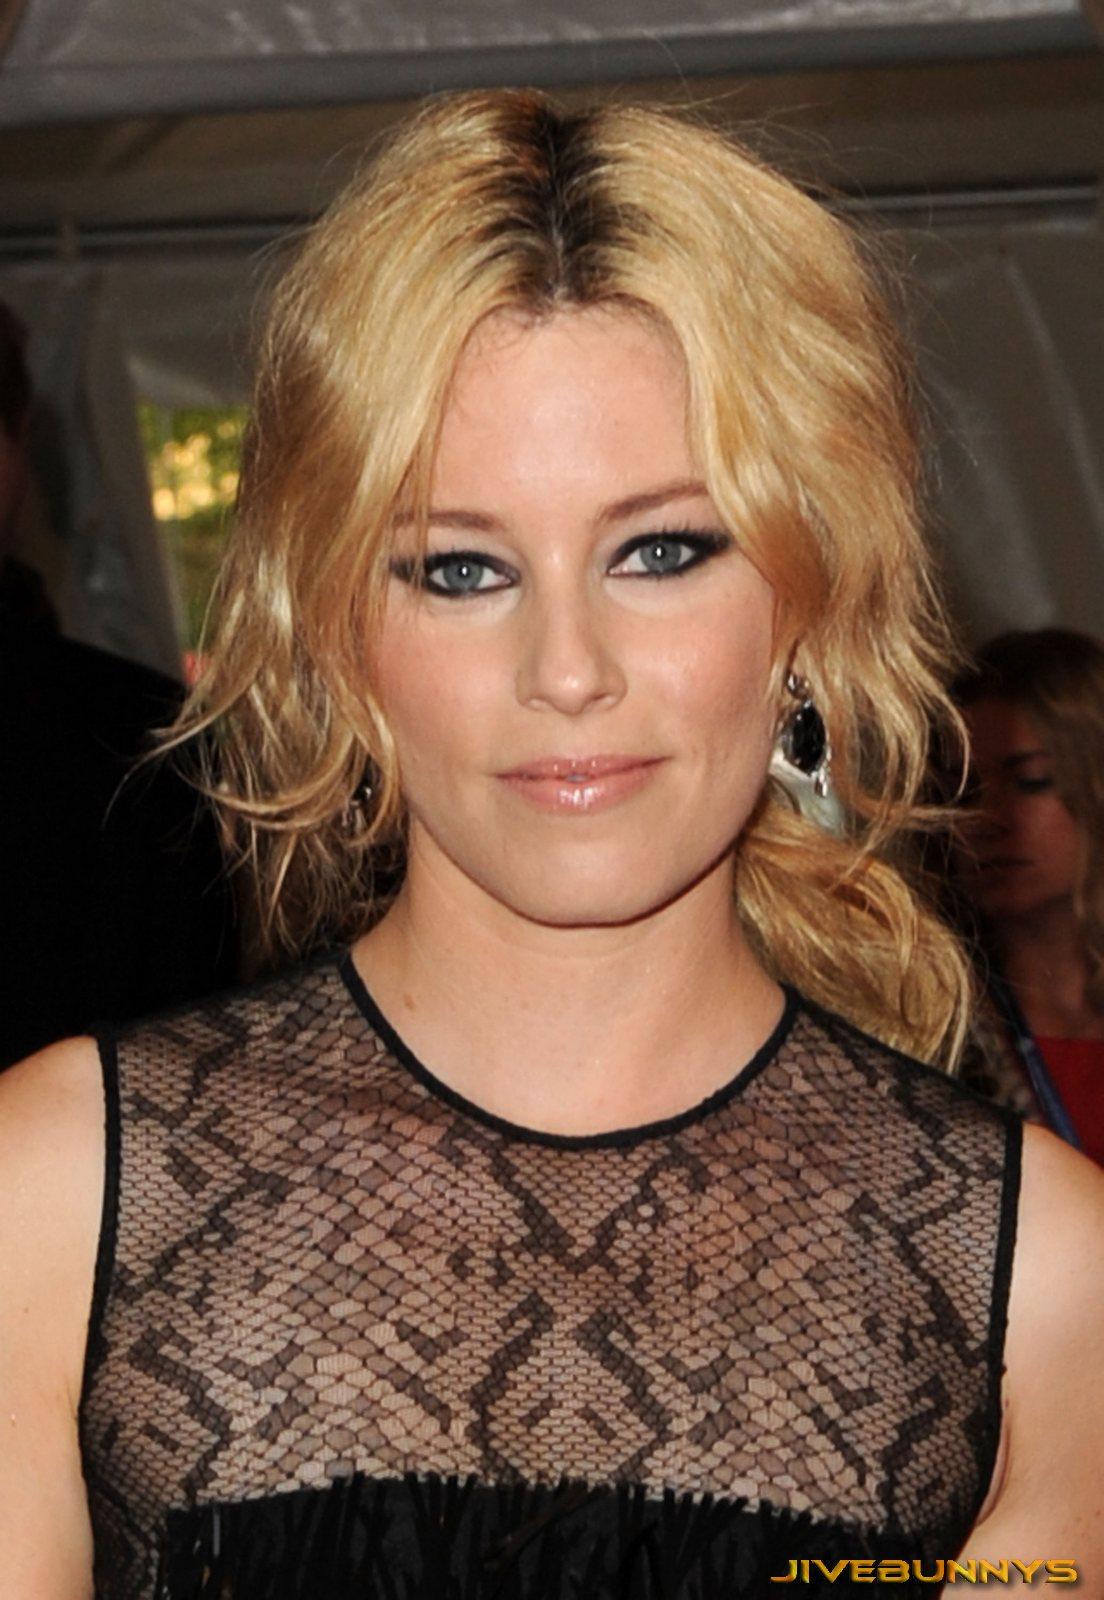 http://4.bp.blogspot.com/-LXqtwgBuPEg/T3XEmANaSWI/AAAAAAAADqs/XUmrPrTMWjo/s1600/elizabeth-banks-actress-celebrity-101059.jpg